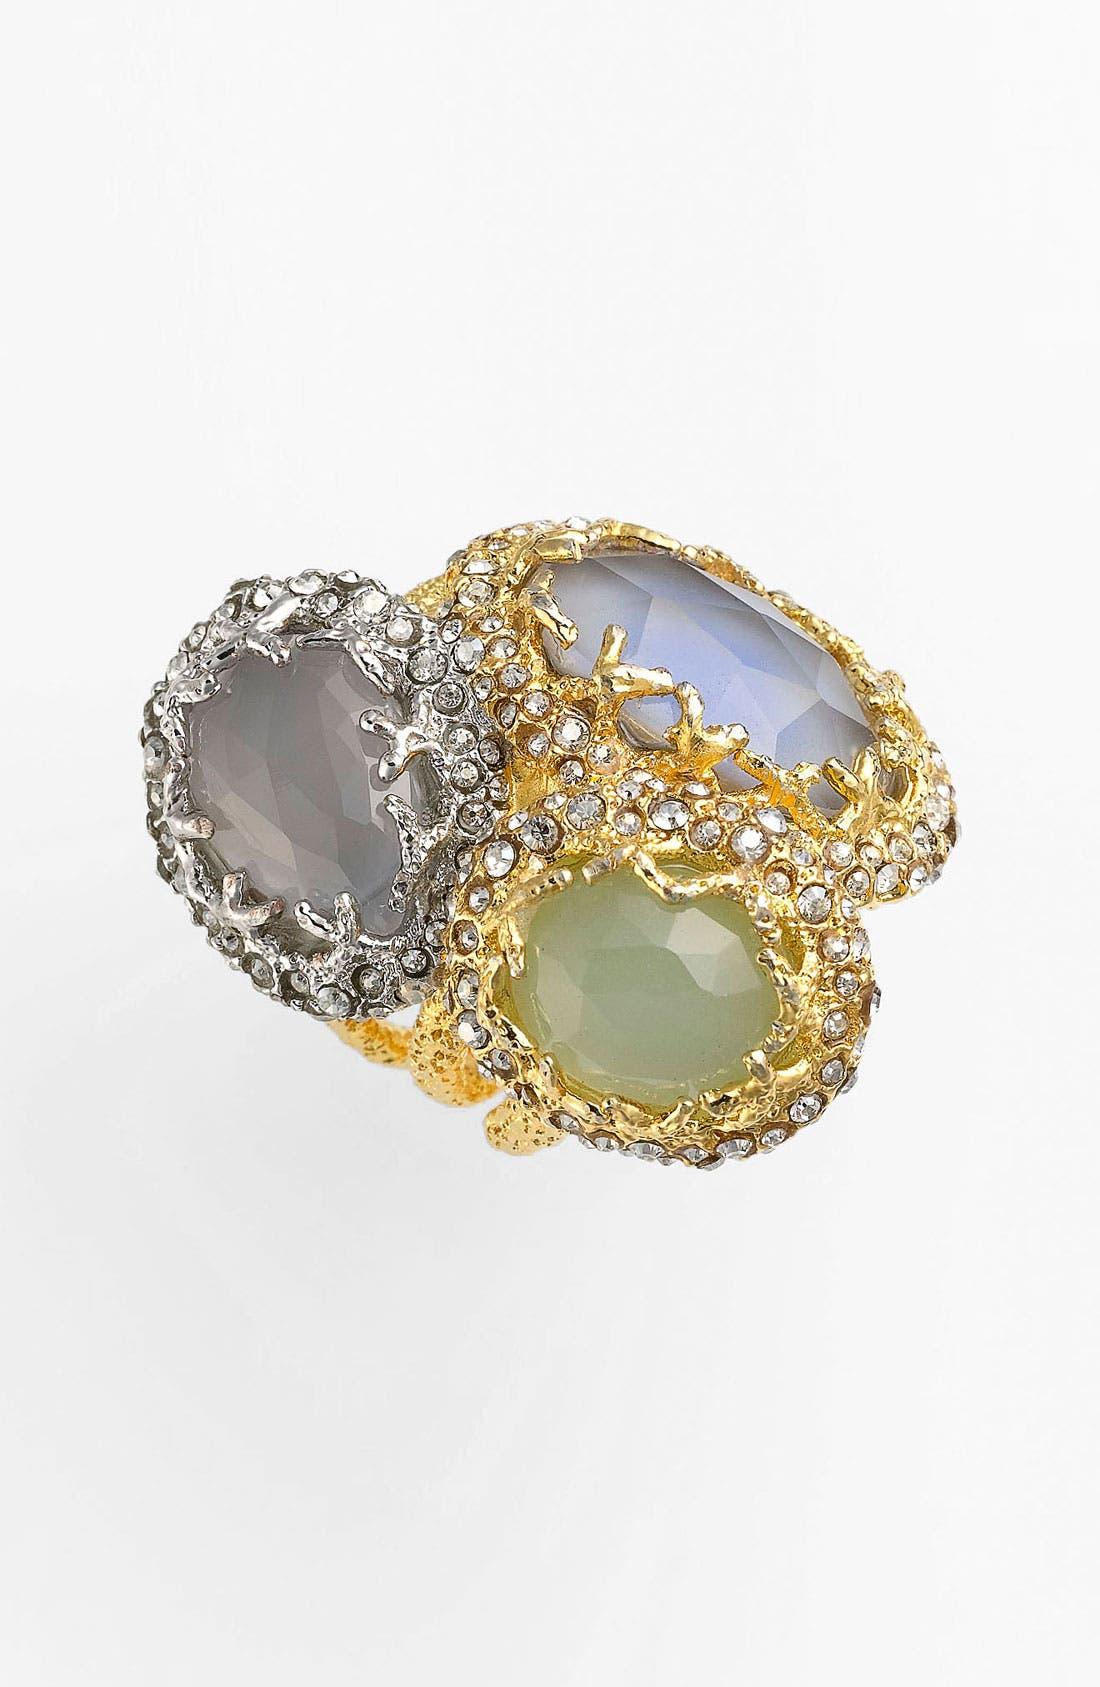 Alternate Image 1 Selected - Alexis Bittar 'Elements - Siyabona' Cluster Stone Ring